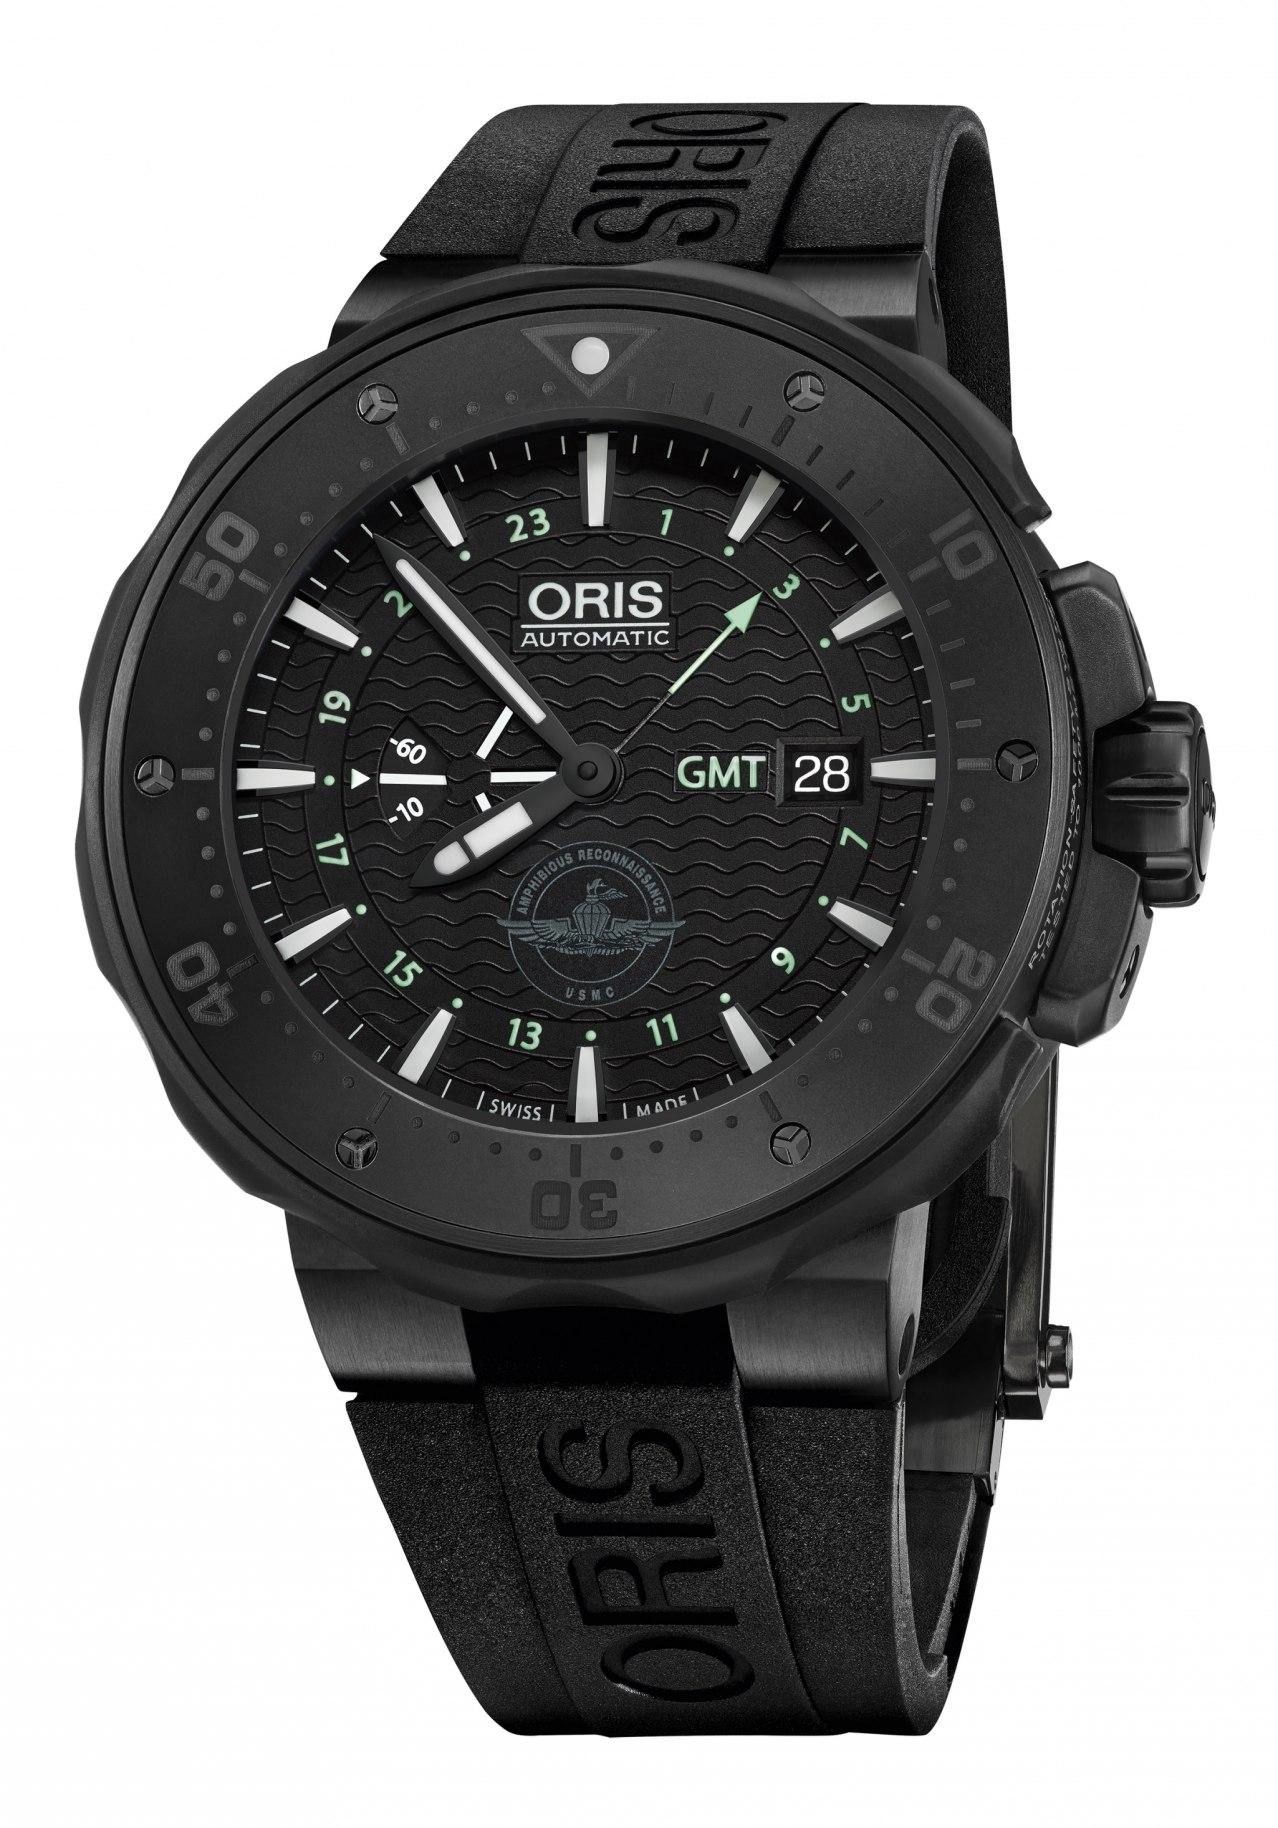 Oris Force Recon GMT Taucheruhr